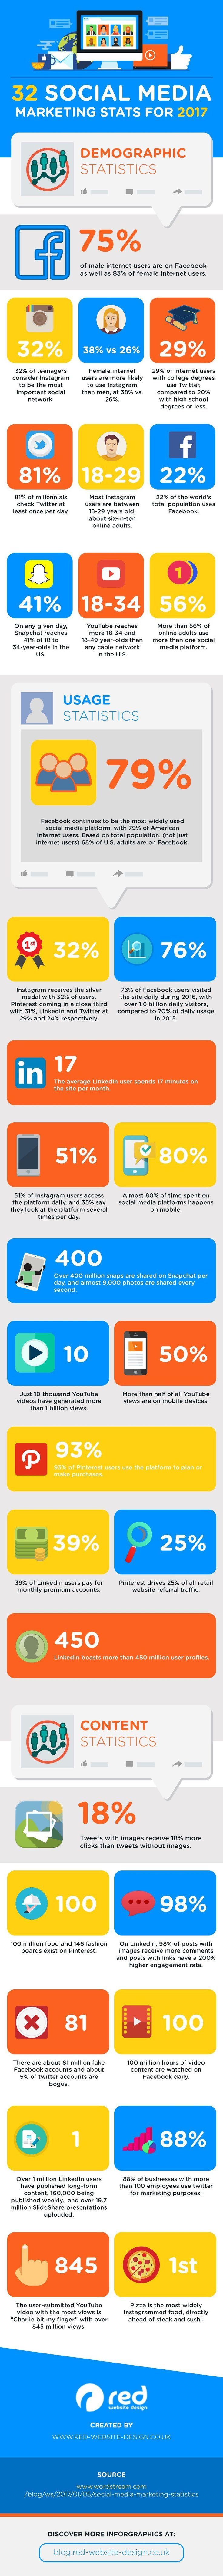 Top social media marketing stats for 2017